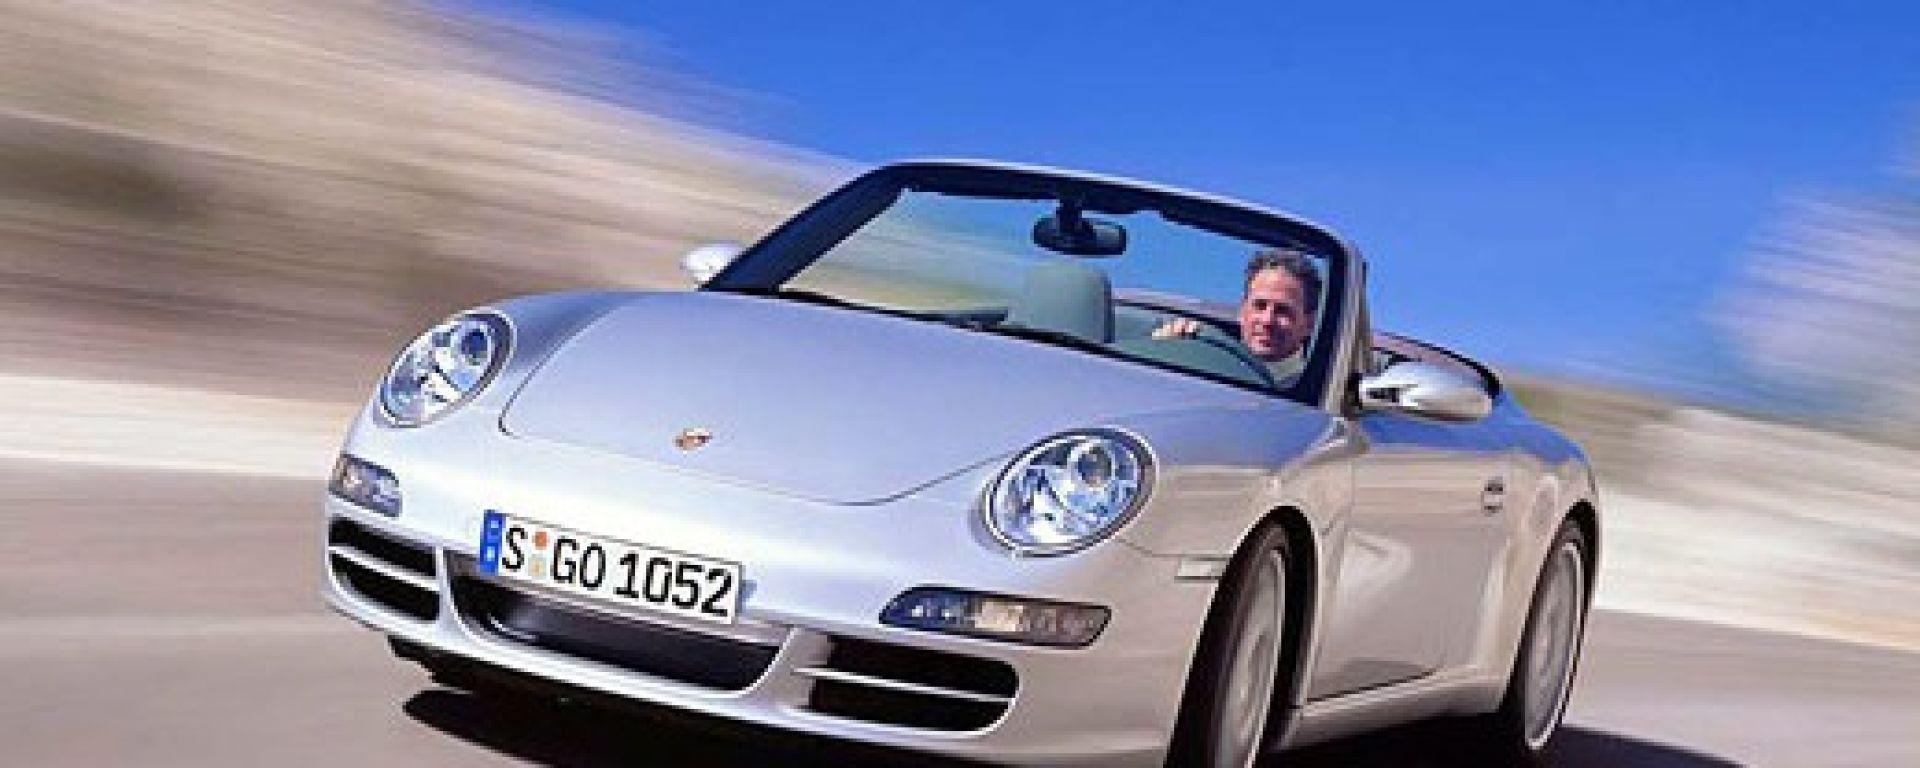 Porsche 911 Cabriolet 2005